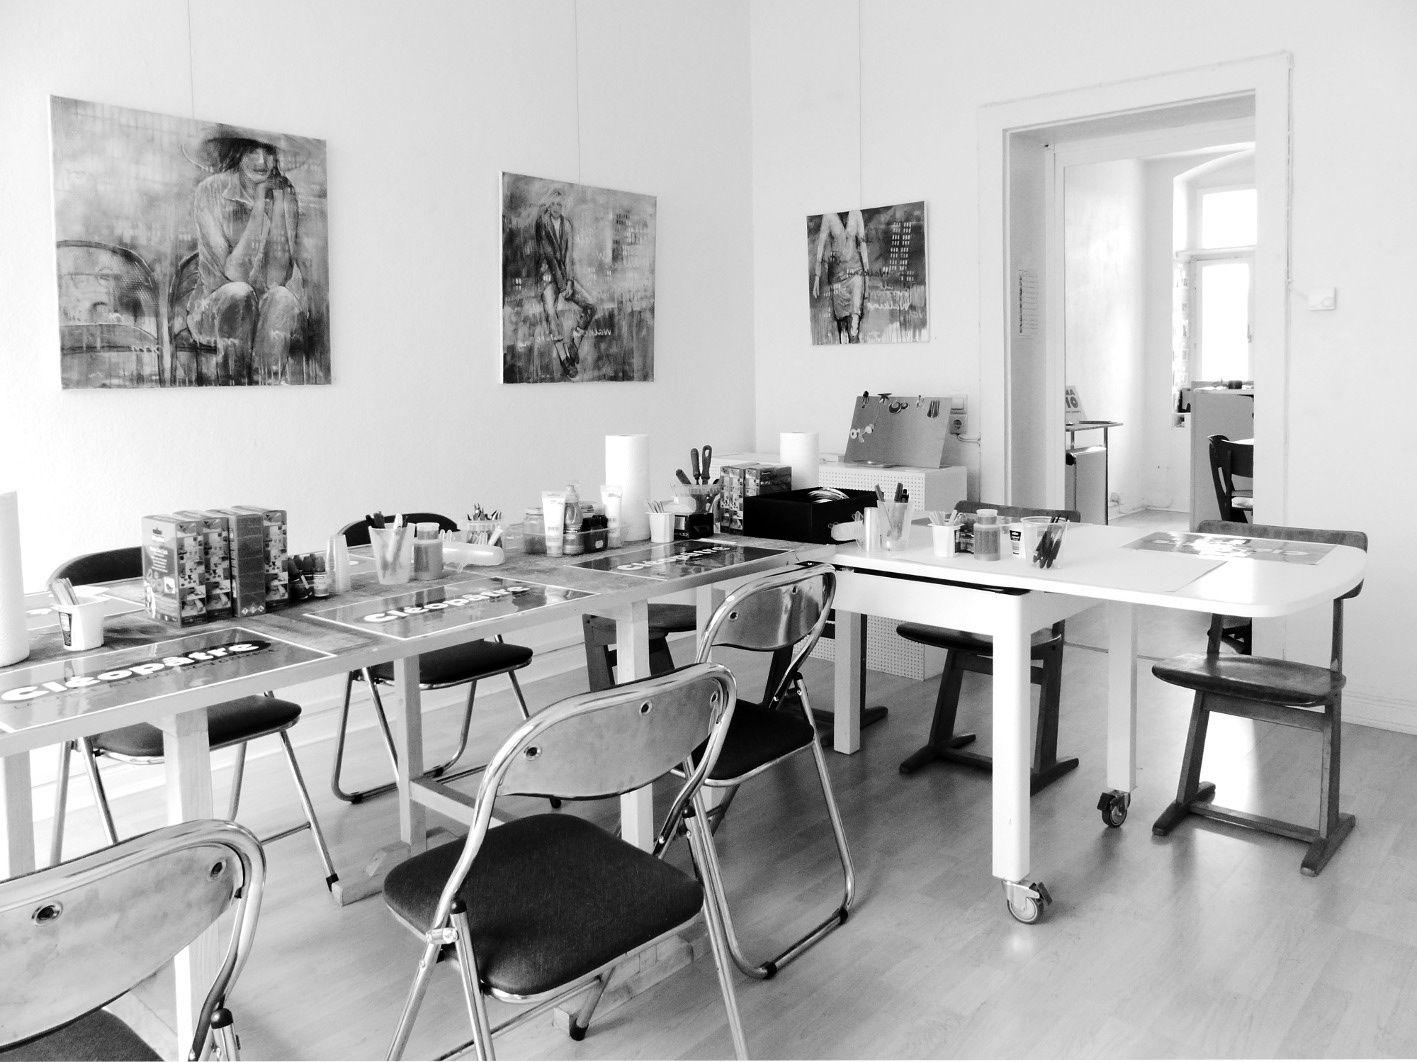 Nachklapp: Kunstharz-Workshop vom 18.03.18